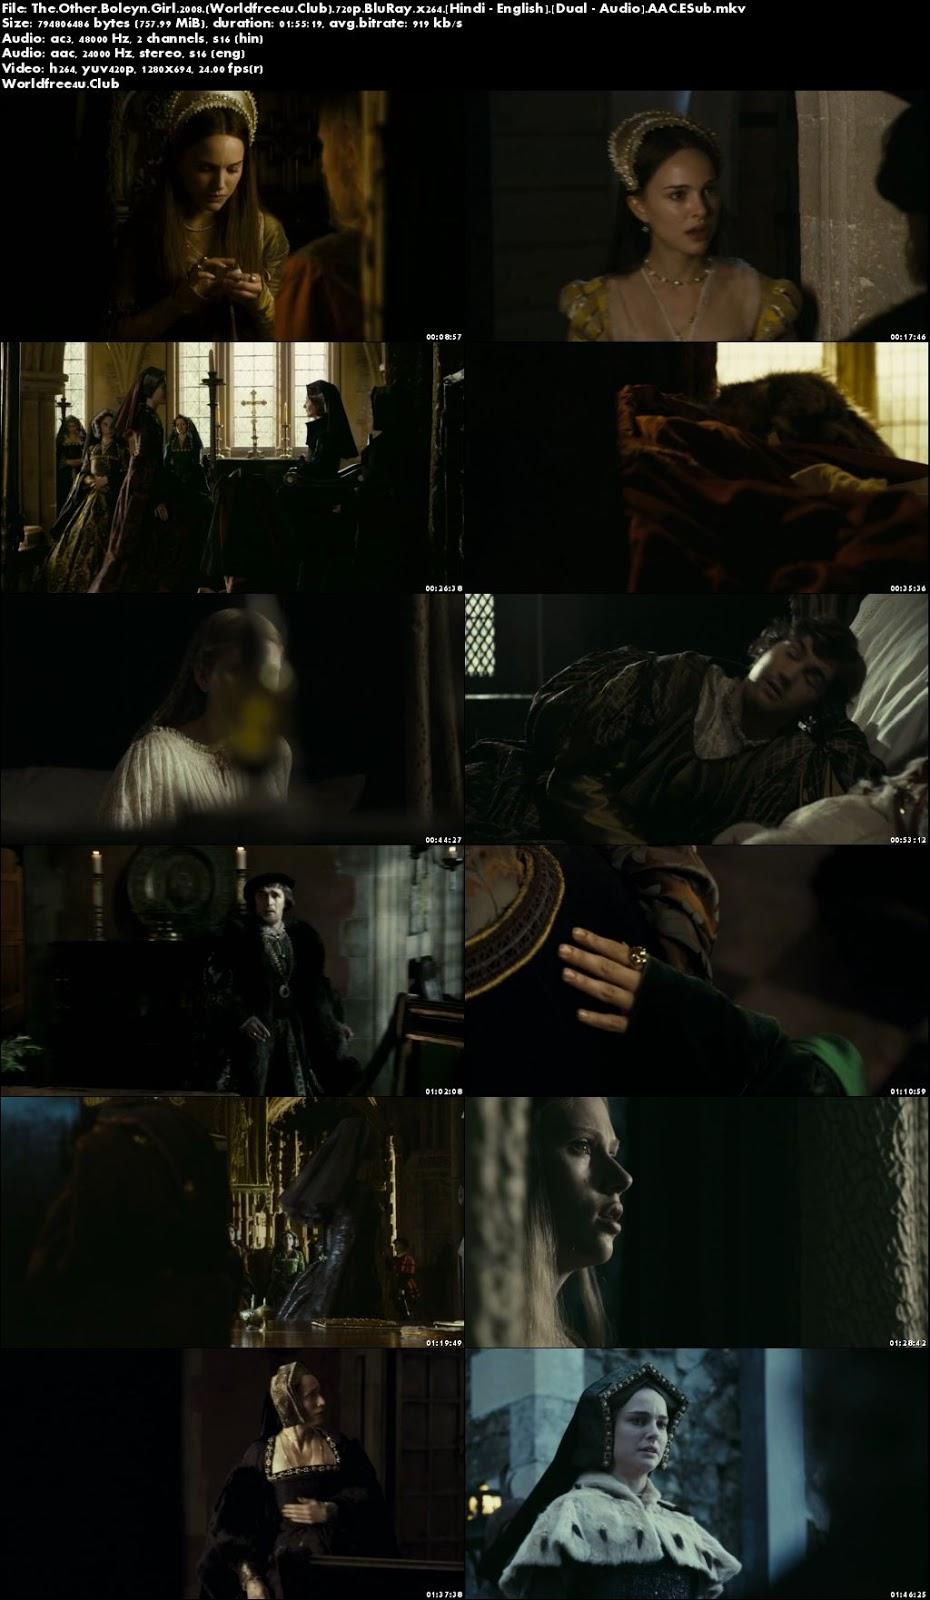 Screen Shoot of The Other Boleyn Girl 2008 BRRip 720p Dual Audio In Hindi English ESub Watch Online